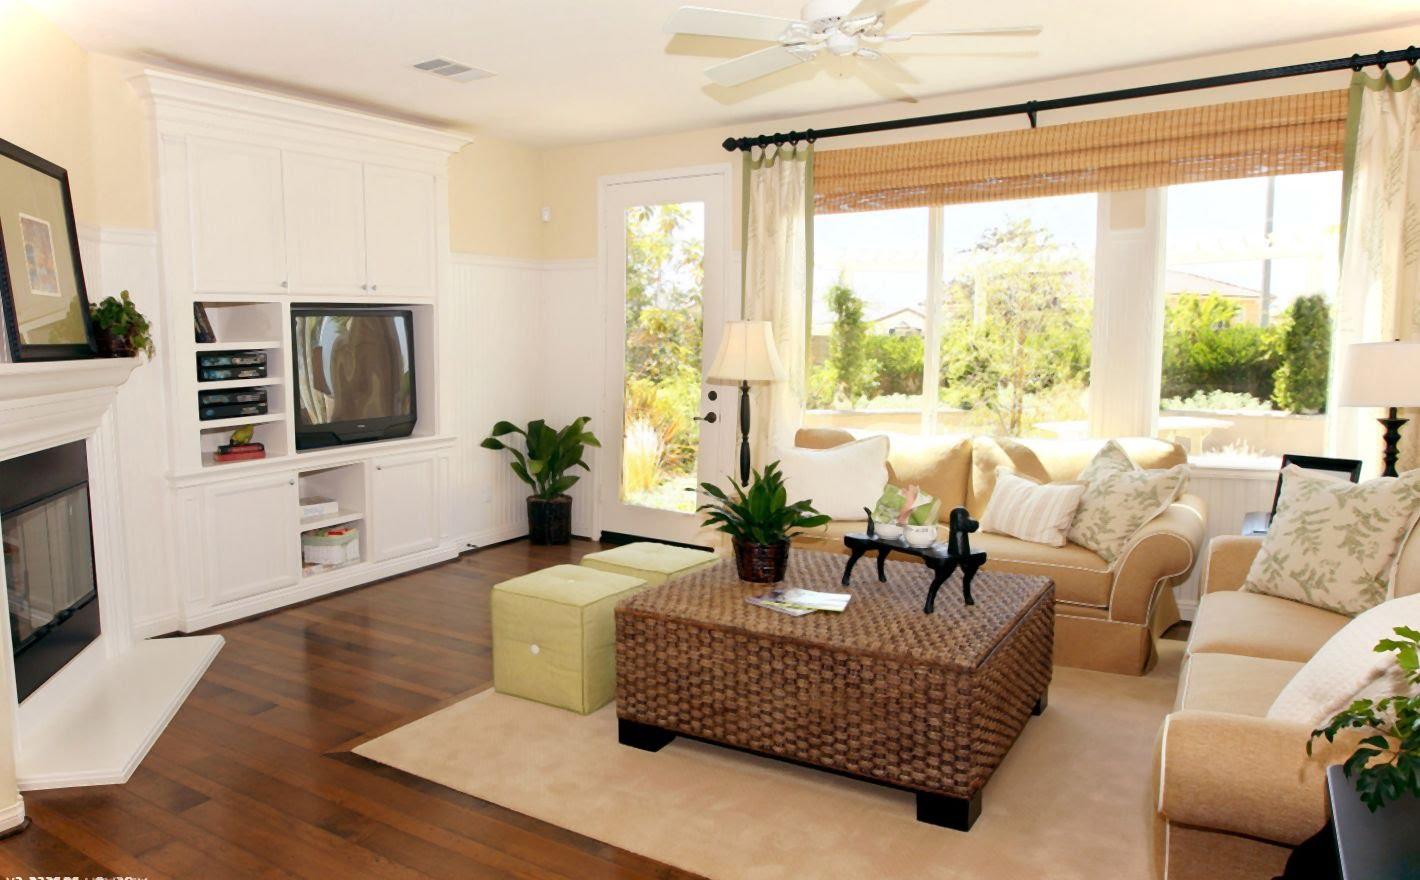 Luxury Simple Home Decor Ideas I Simple Creative Home Decorating Ideas - YouTube simple home decoration ideas